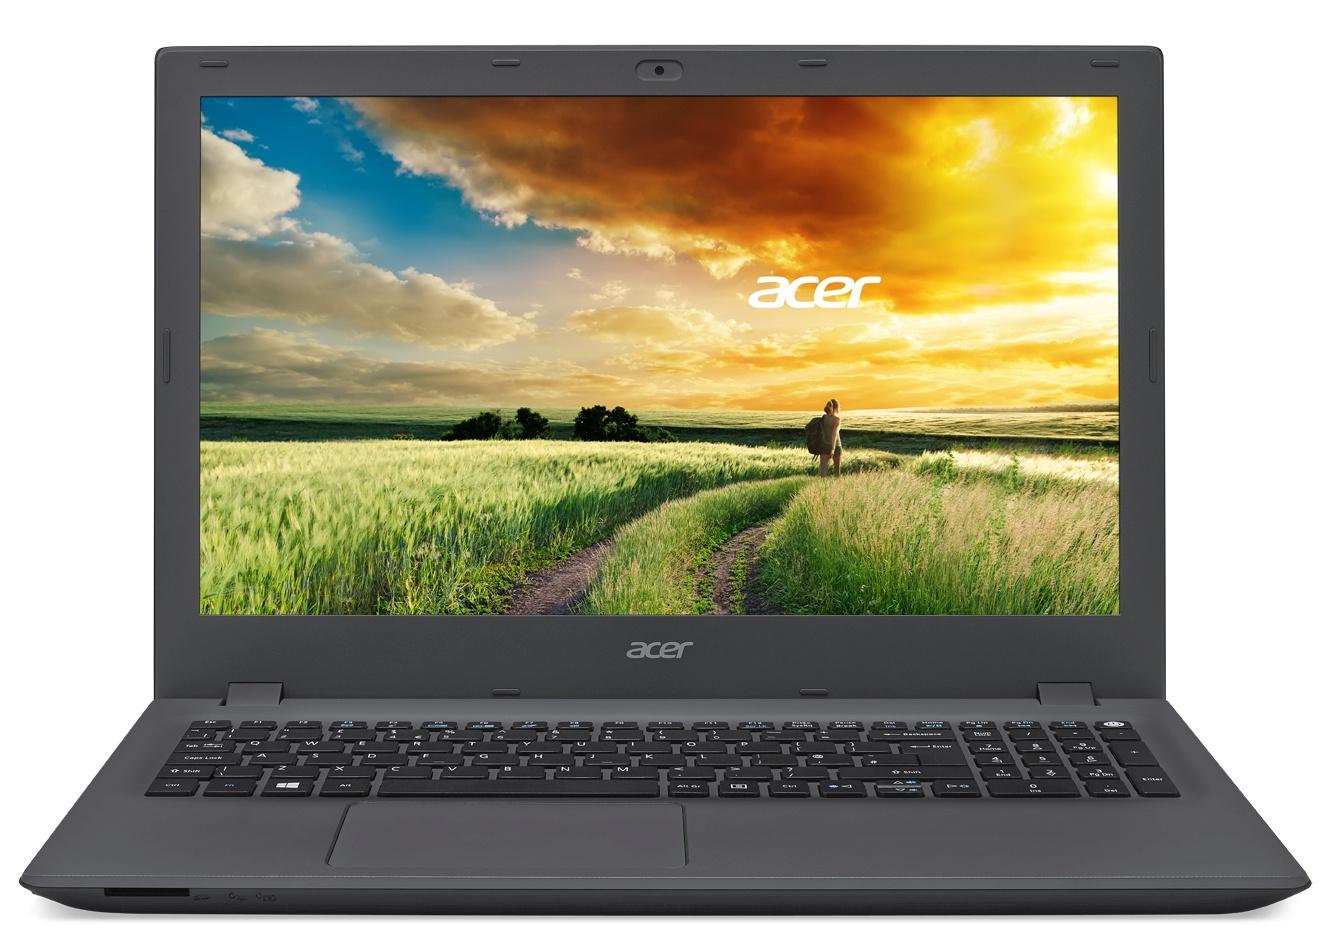 Acer Aspire E 15 15,6/3556/4G/1TB/NV/W10 šedý